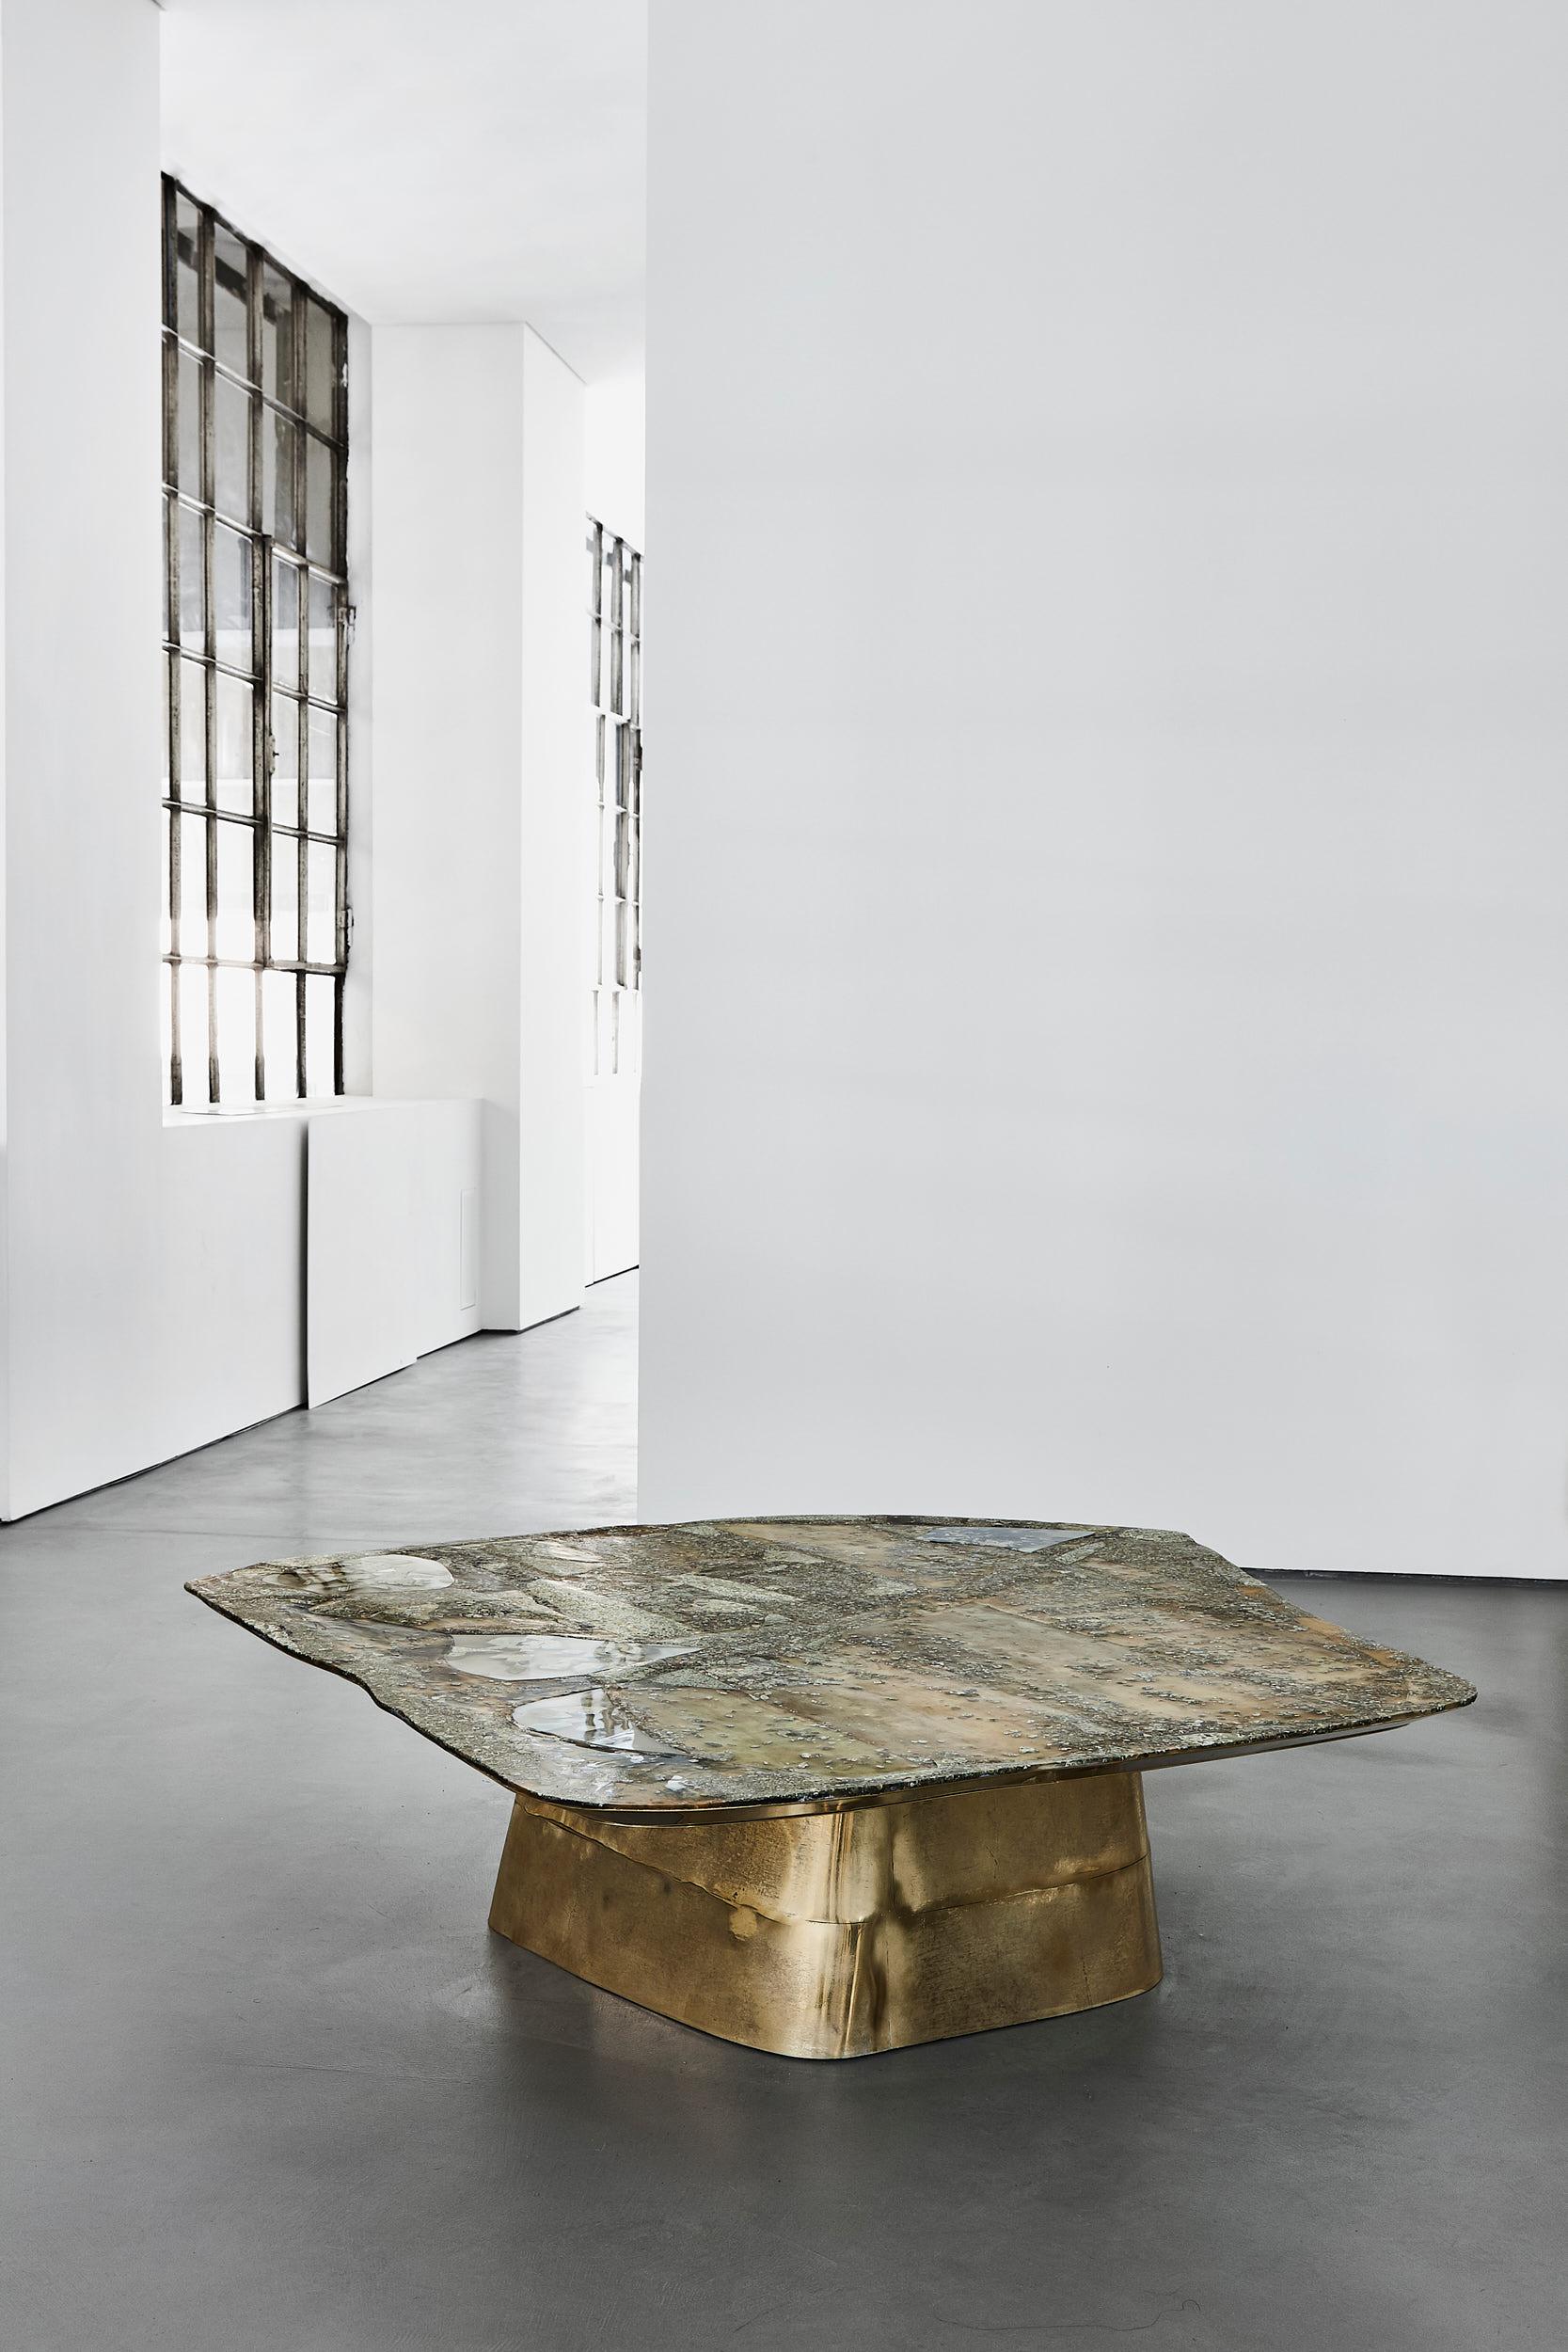 En Plein Air : Vincenzo De Cotiis' Latest Show at Carpenters Workshop Gallery, London on Anniversary Magazine